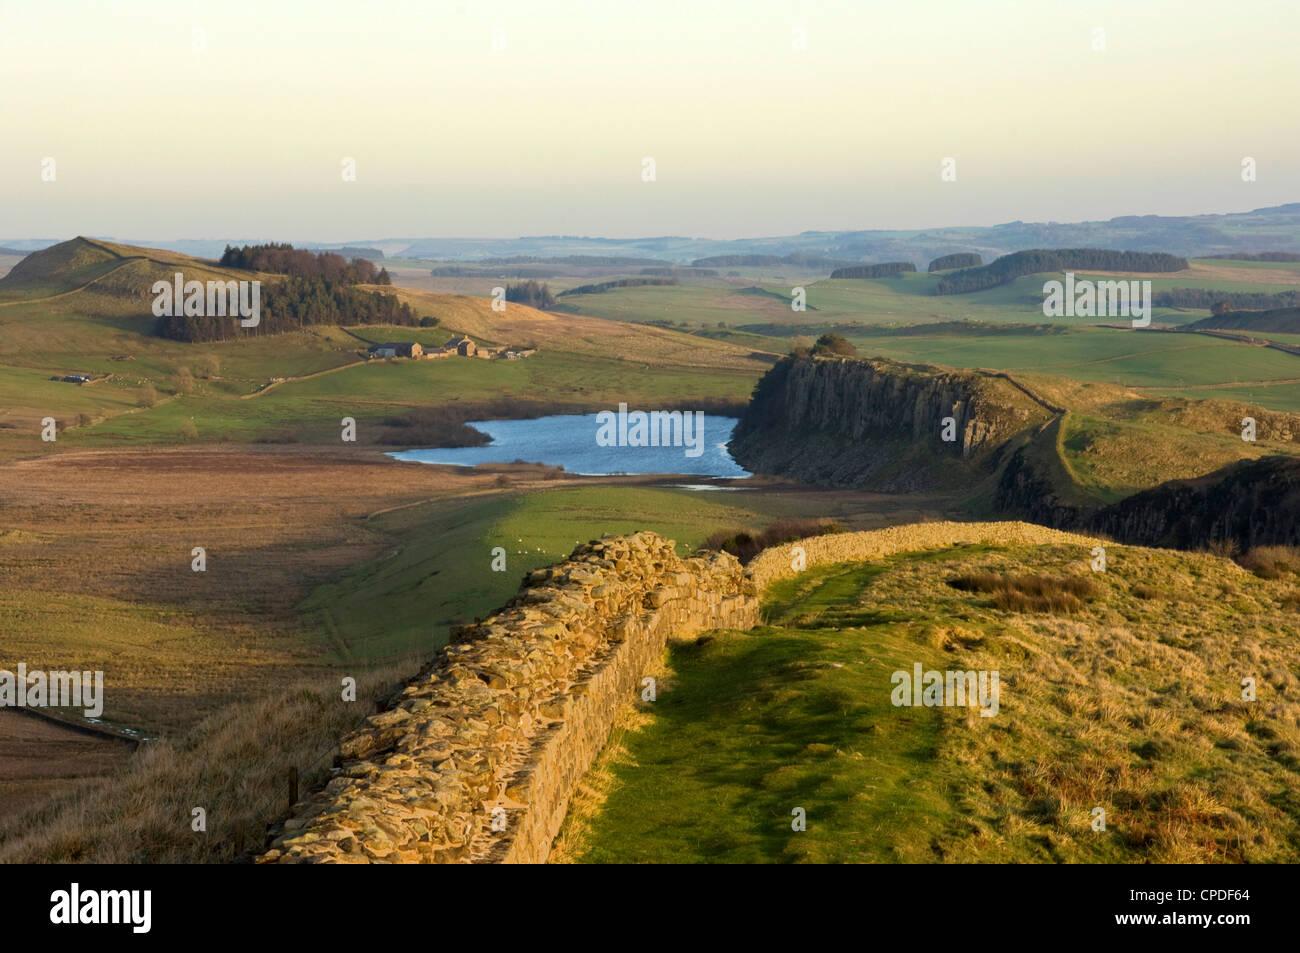 Towards sunset, view east along Hadrians Wall, Northumbria, England, UK - Stock Image